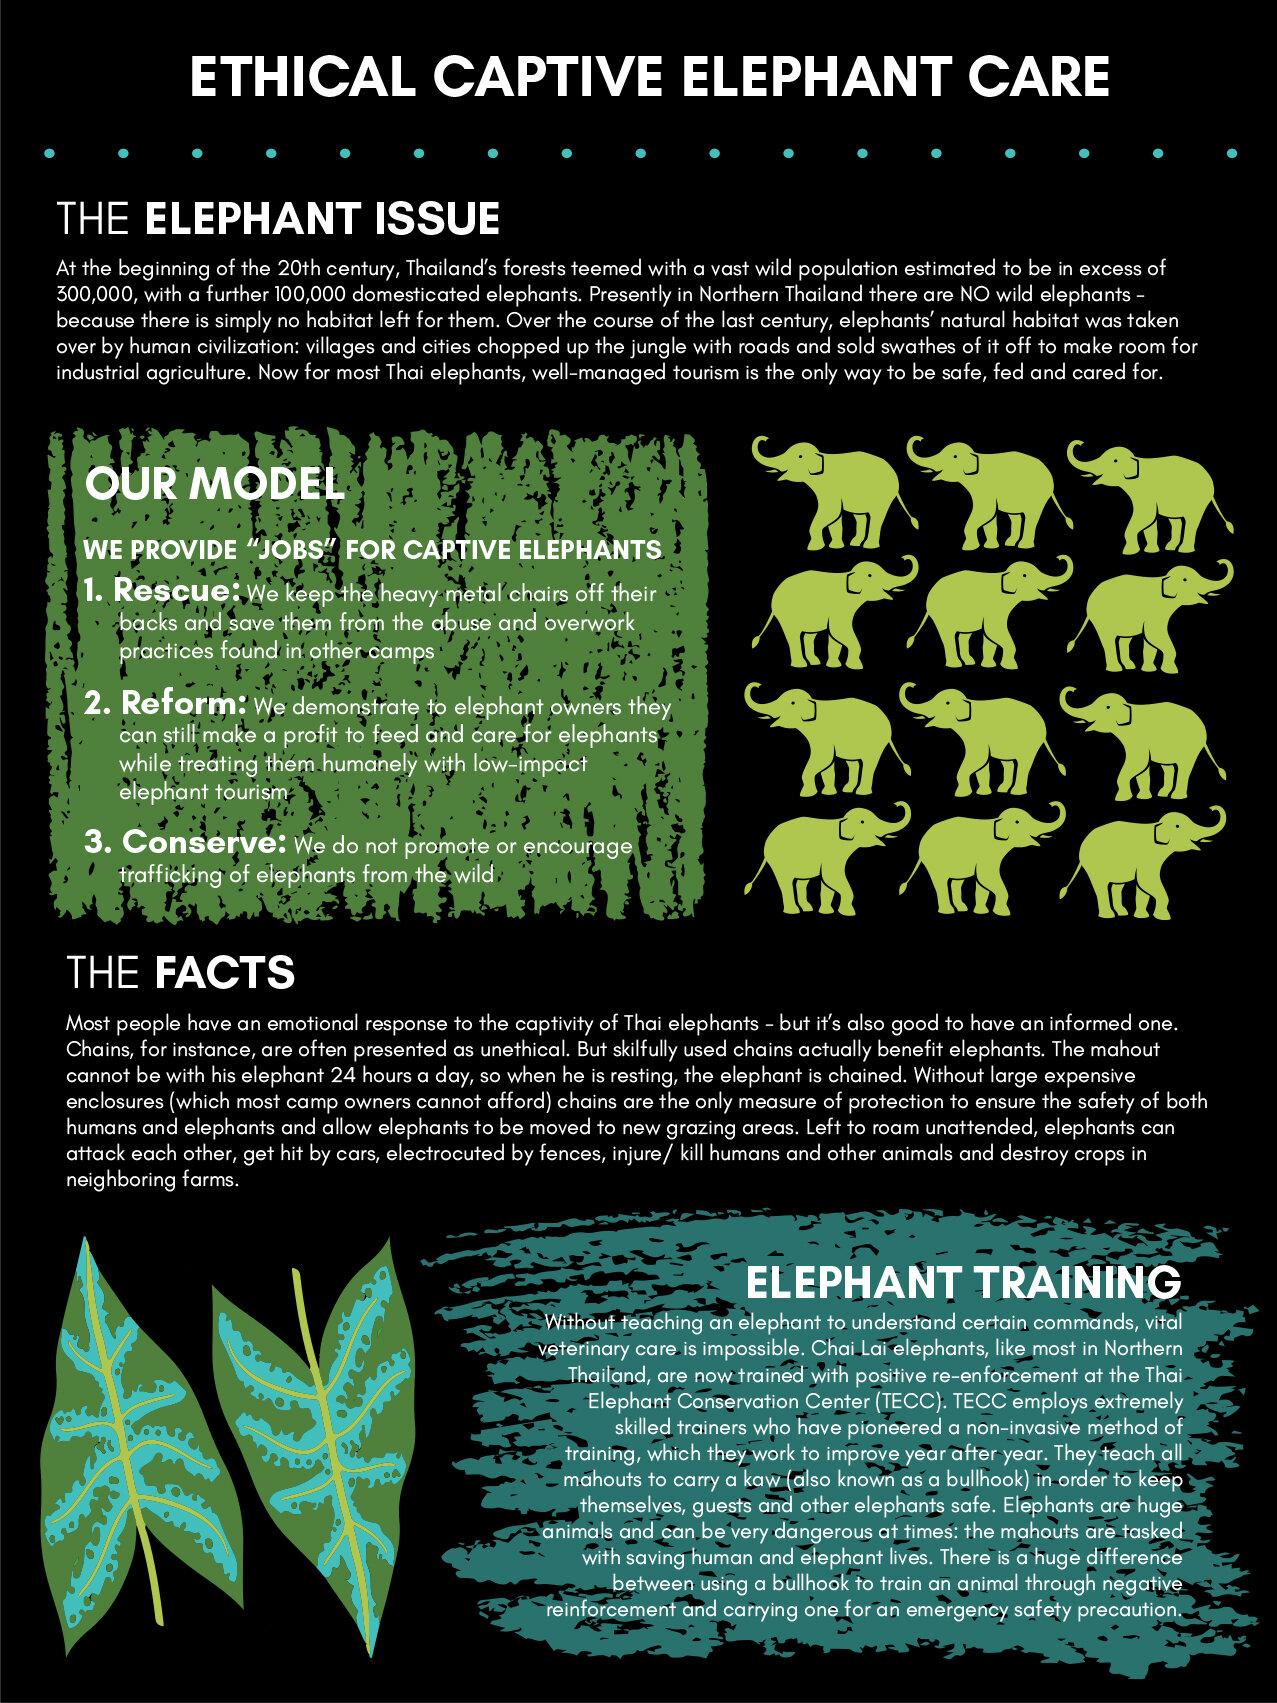 elephantposters1_smaller.jpg